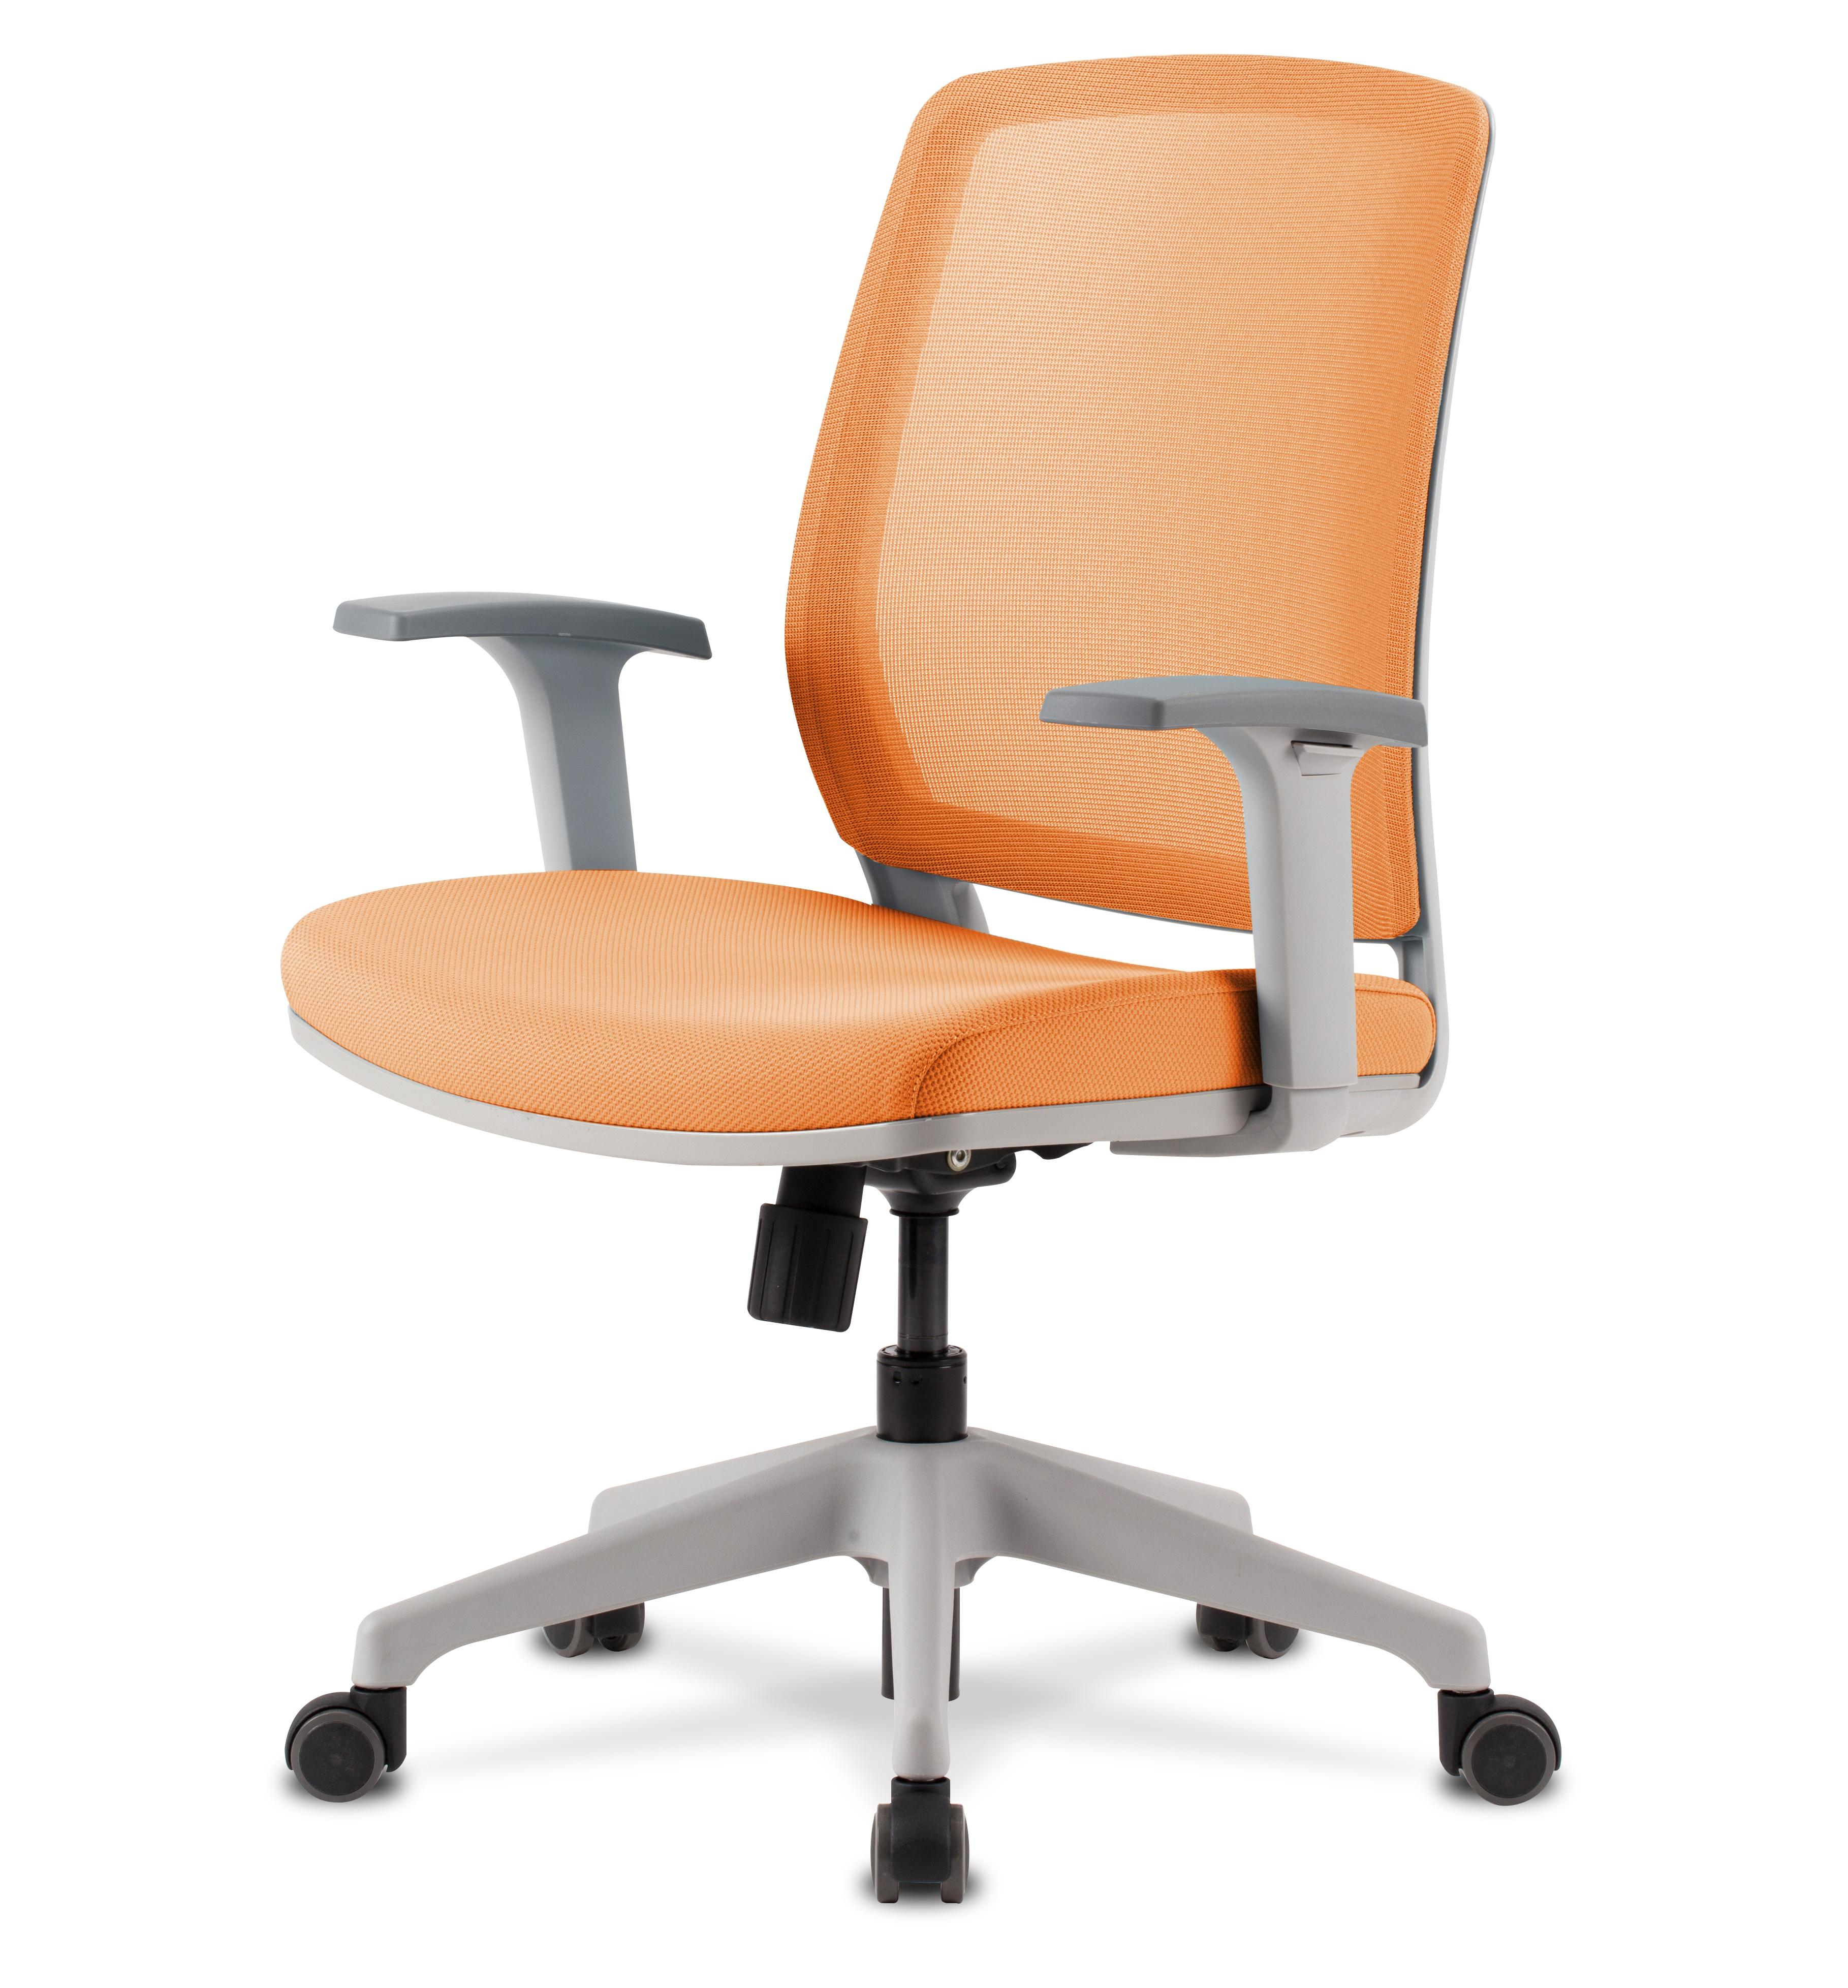 Cobi chair by DAWON CHAIRS